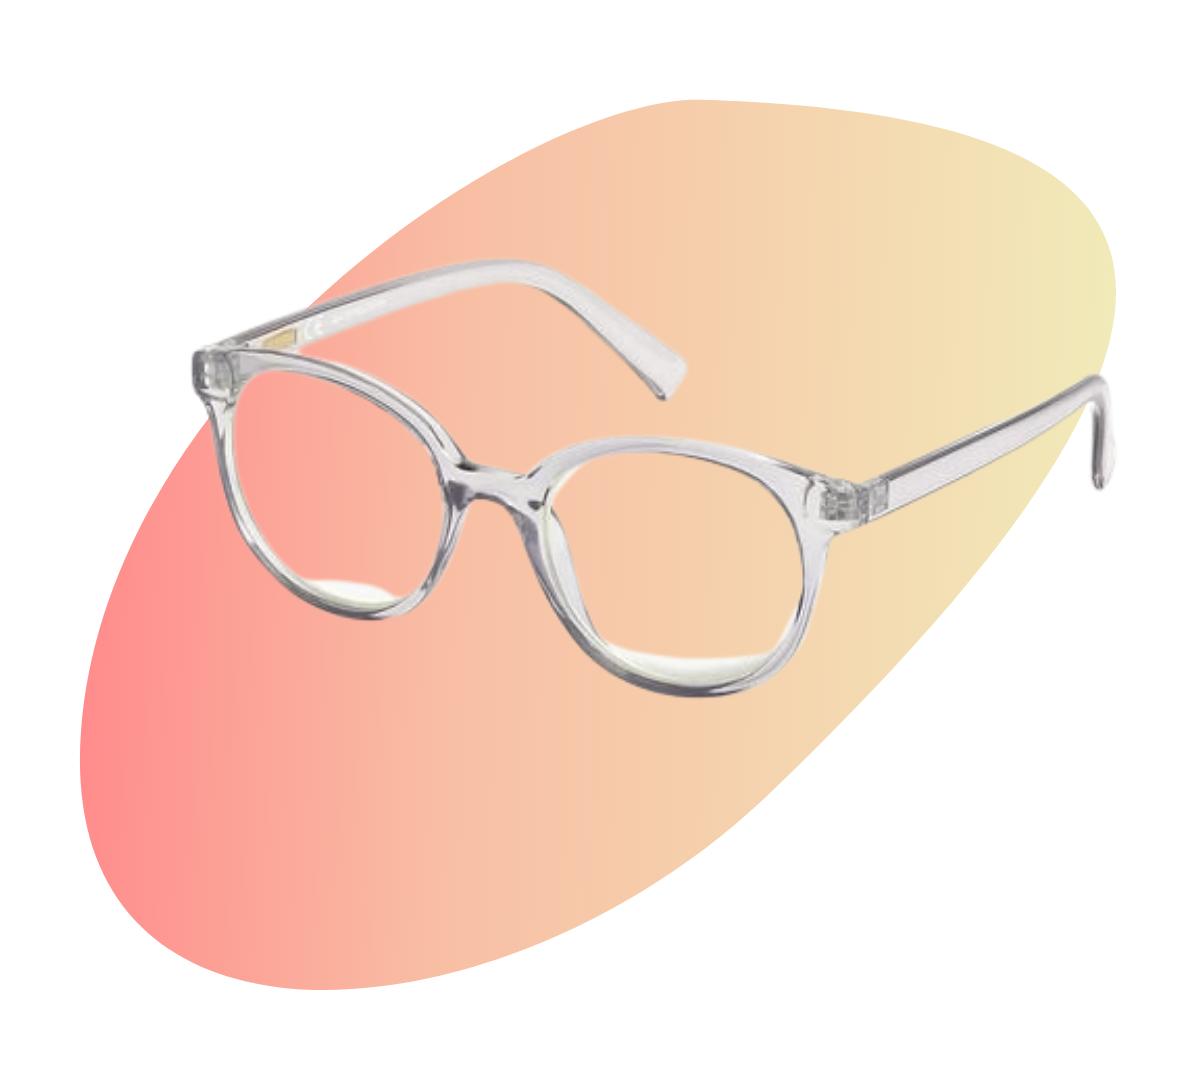 j.crew crystal clear Blue-light glasses